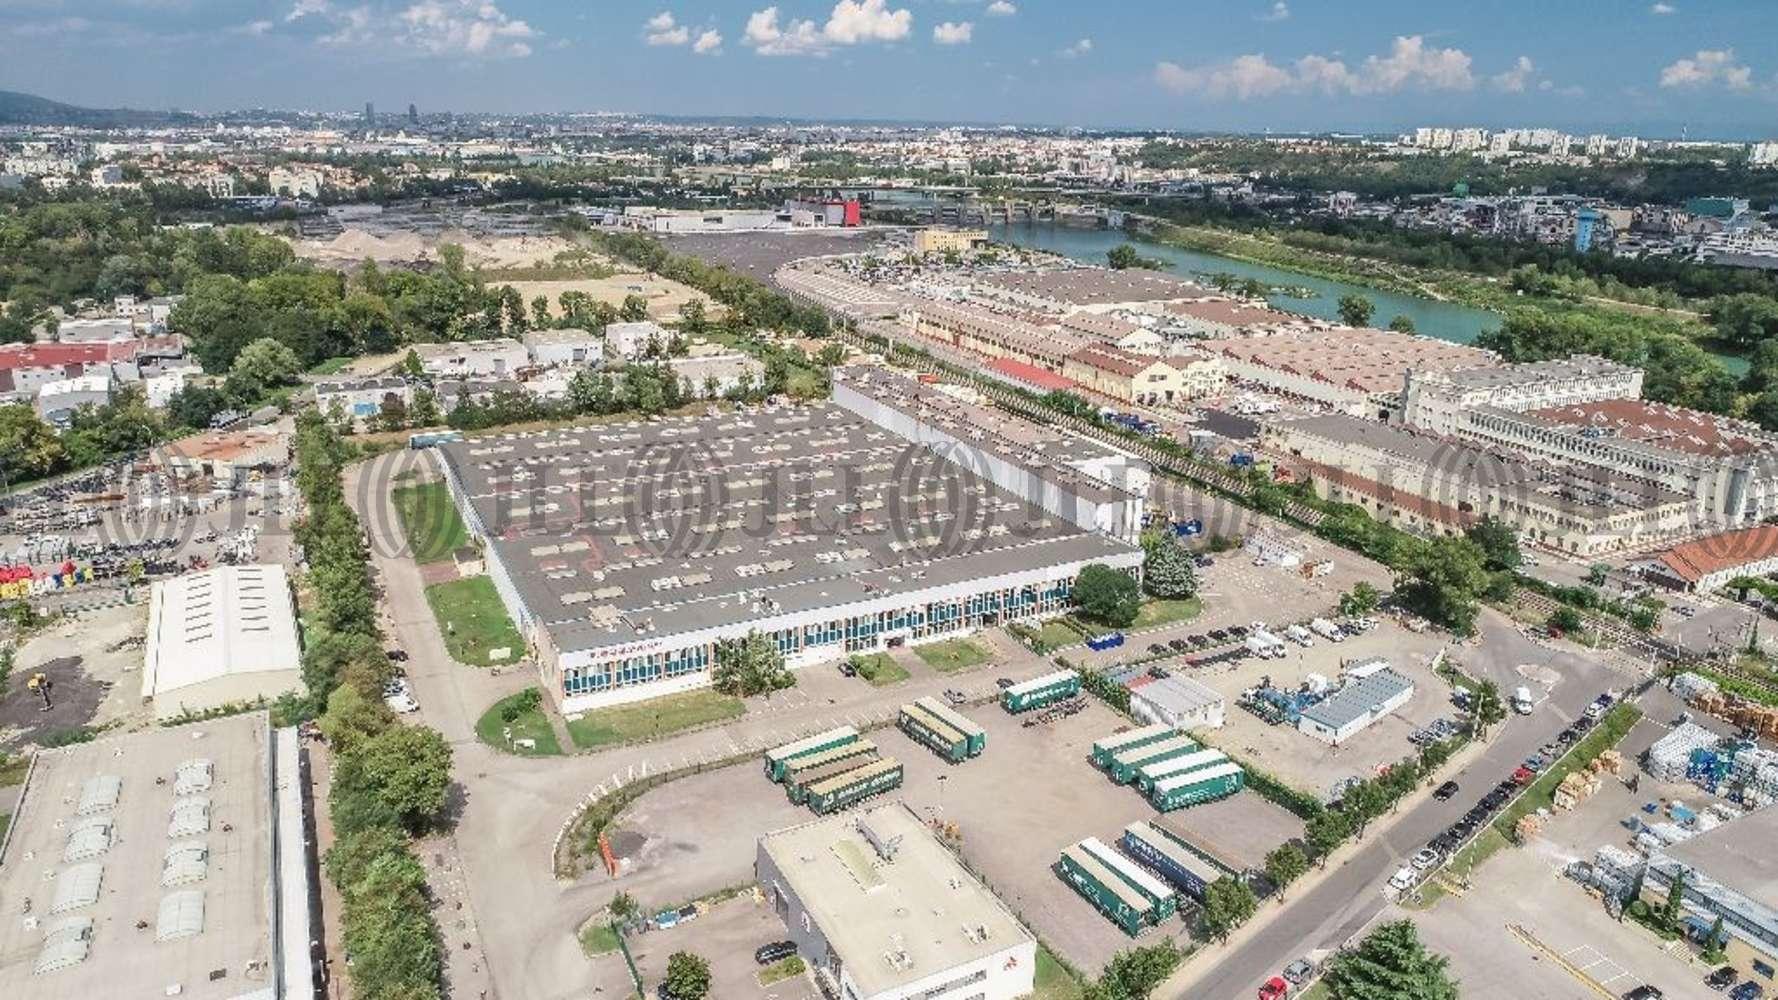 Plateformes logistiques Irigny, 69540 - Entrepot à vendre Lyon Sud - Irigny - 9959535